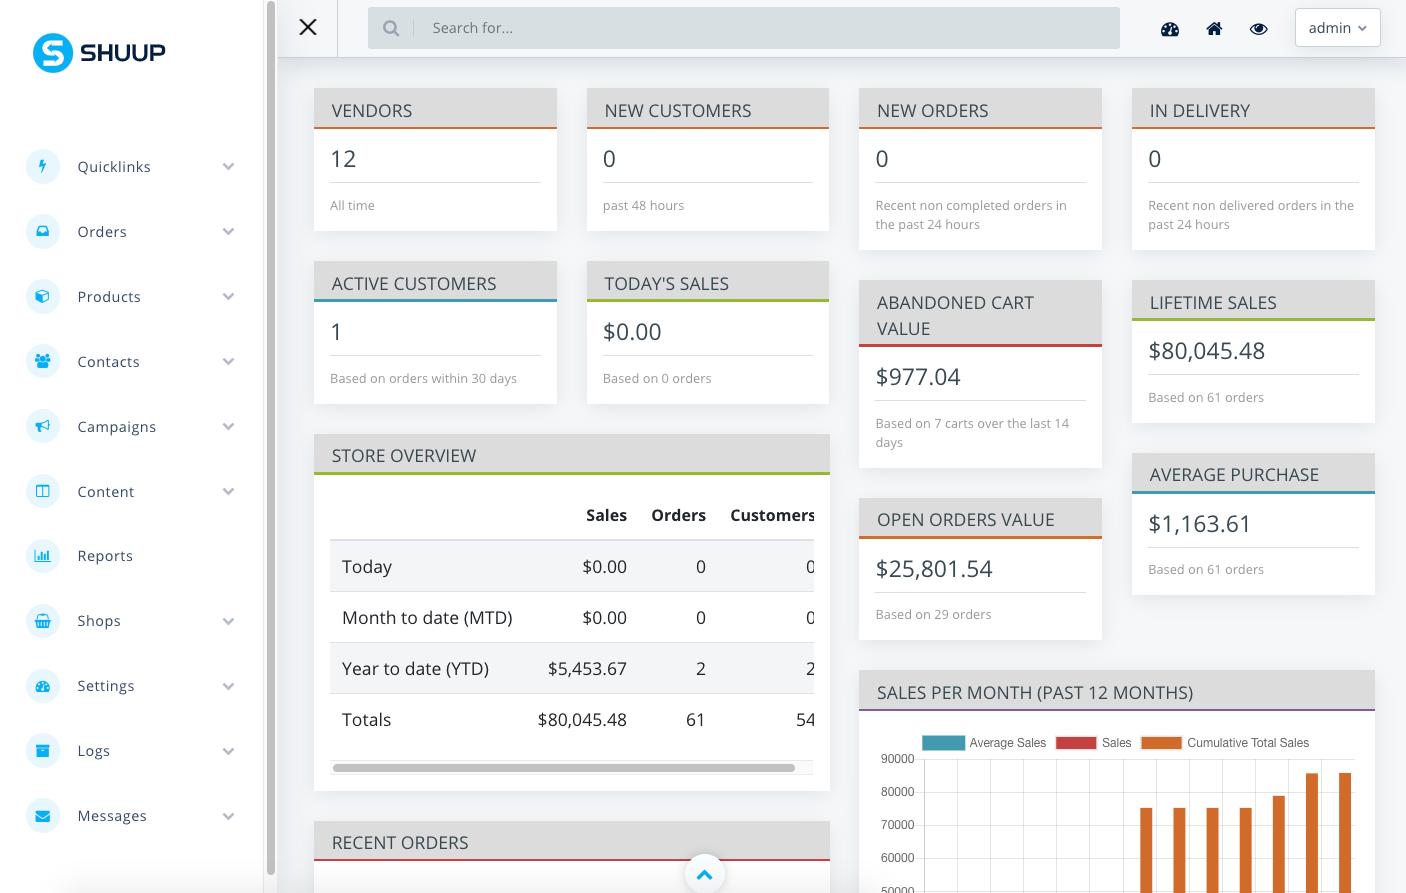 Shuup admin dashboard for managing unlimited vendors.